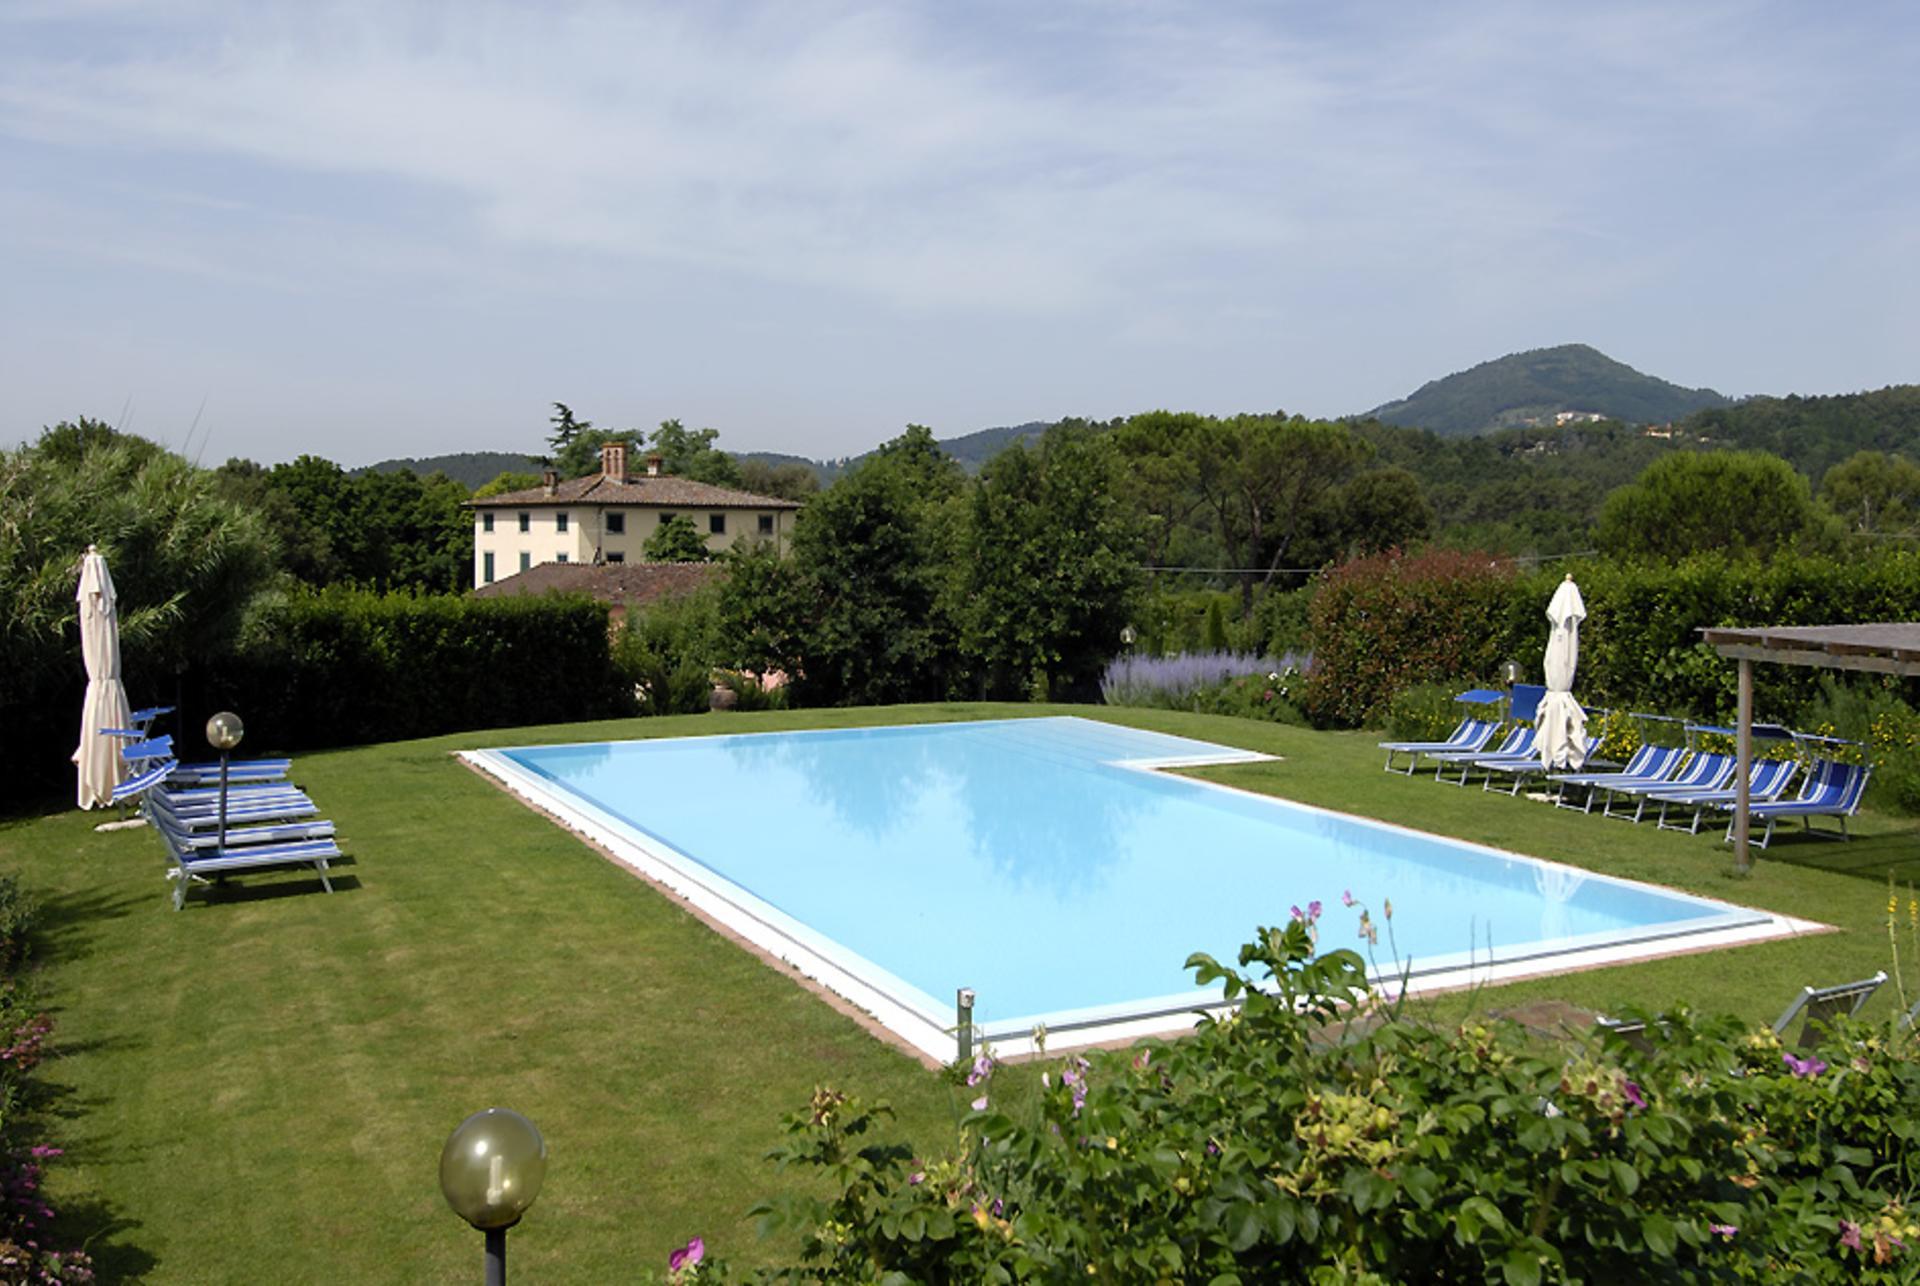 Outdoor Pool 1, Il Maniero, Lucca, Tuscany.